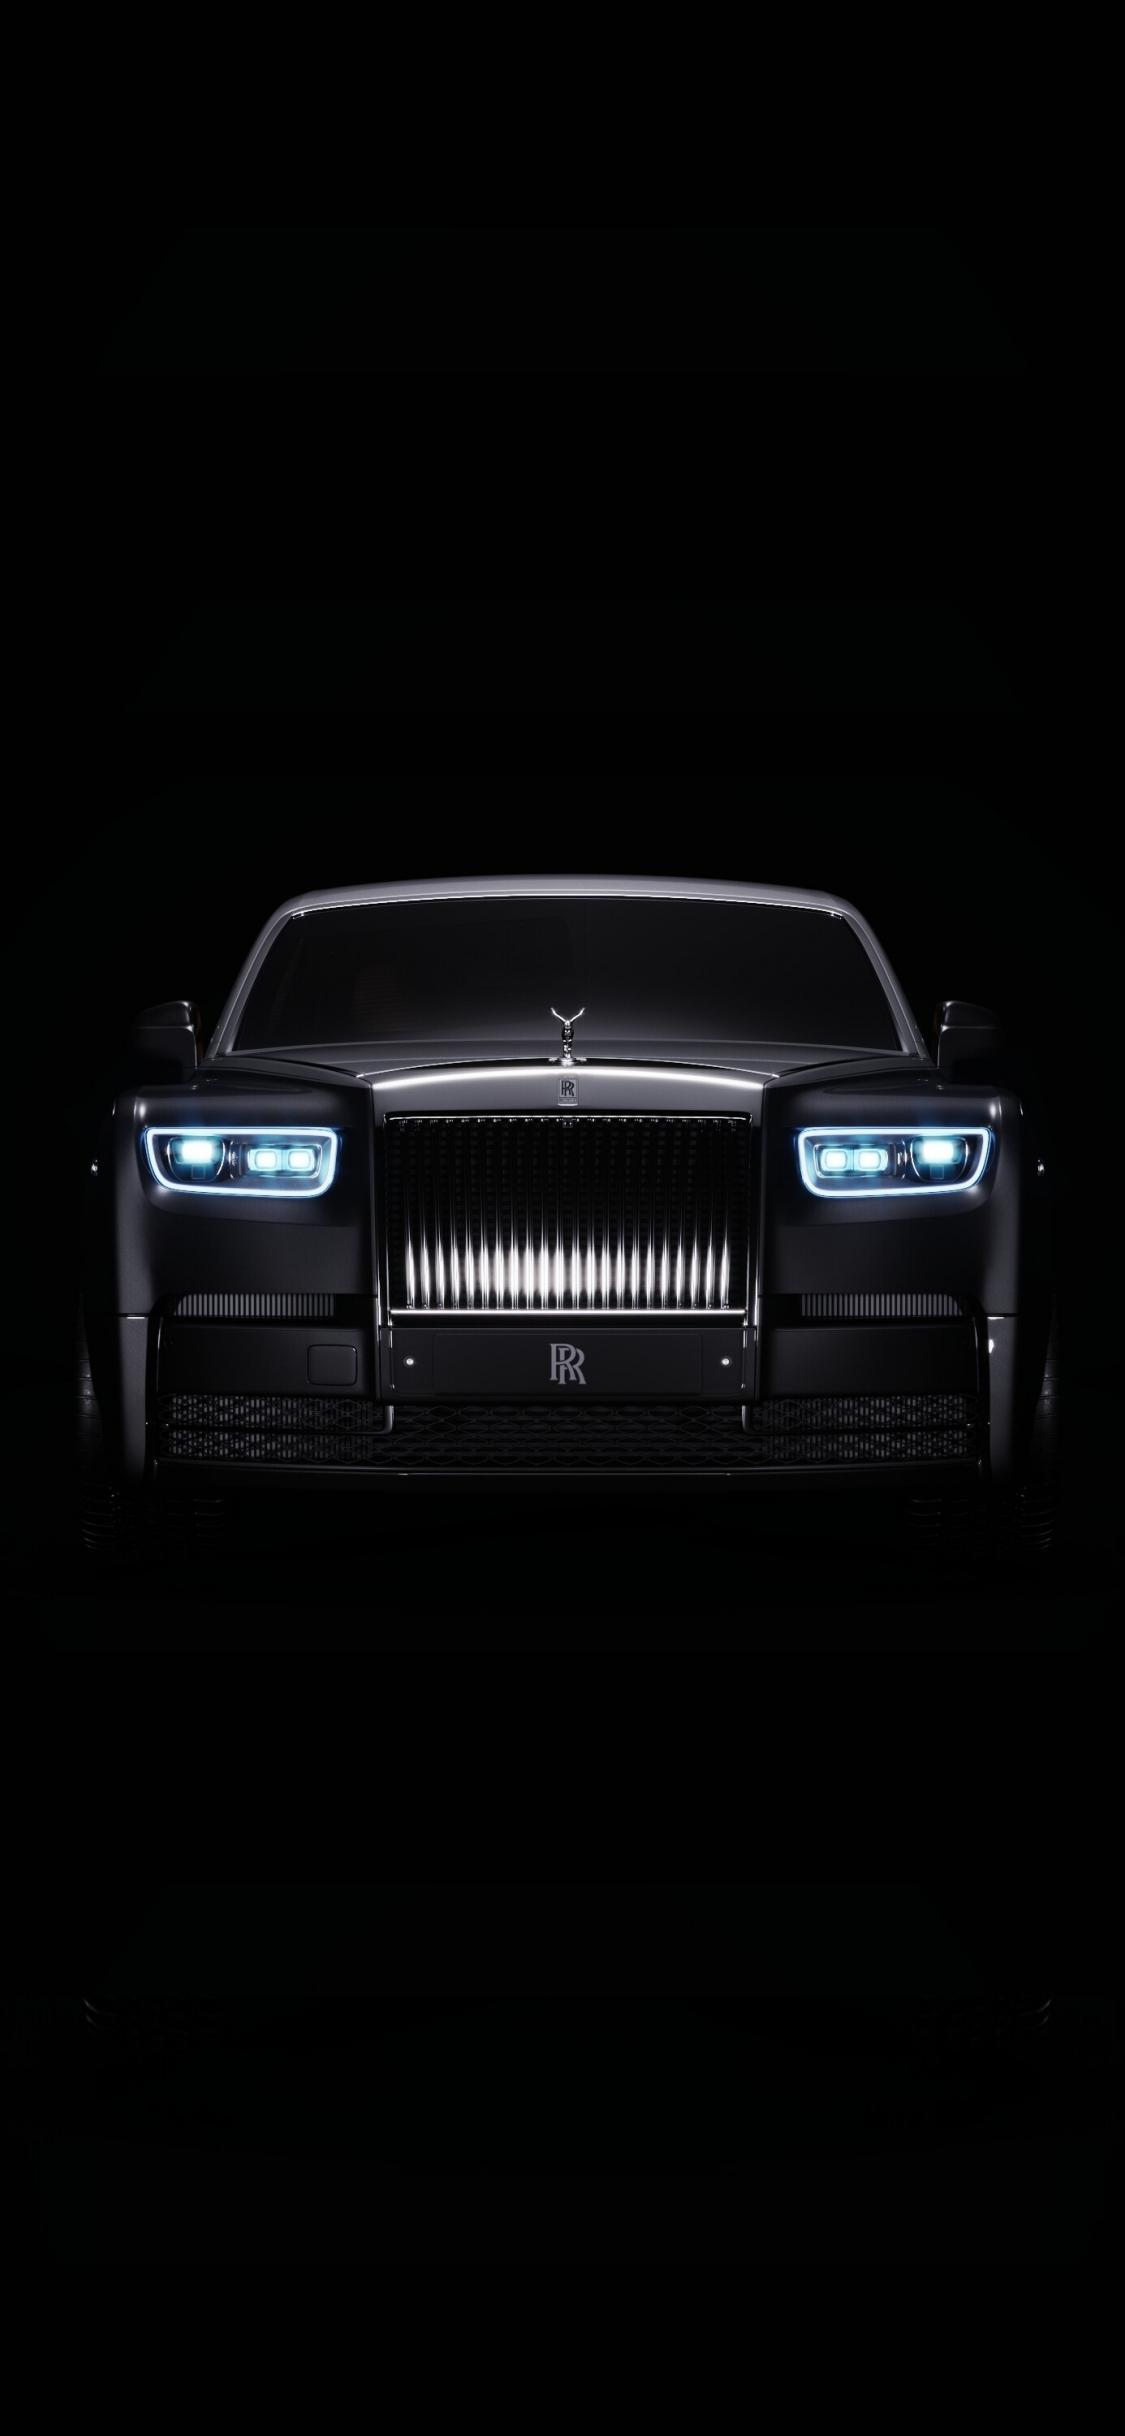 Download 1125x2436 Wallpaper Front Rolls Royce Phantom Portrait Iphone X 1125x2436 Hd Image Background 22282